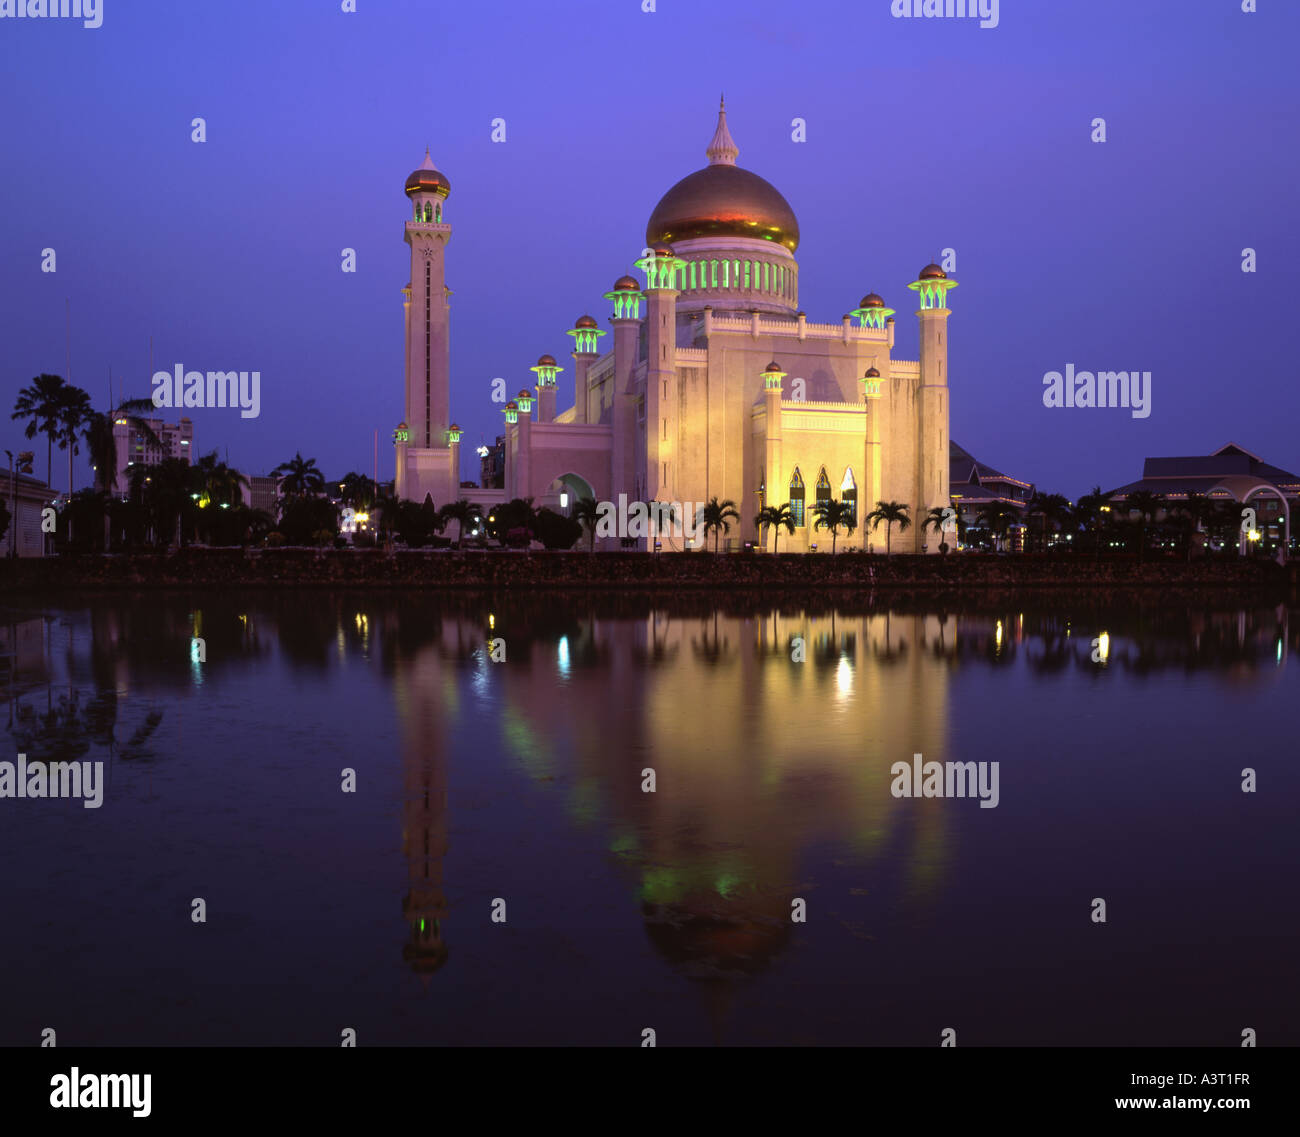 Omar Ali Saifuddin Mosque in Bandar Seri Begawan Brunei - Stock Image